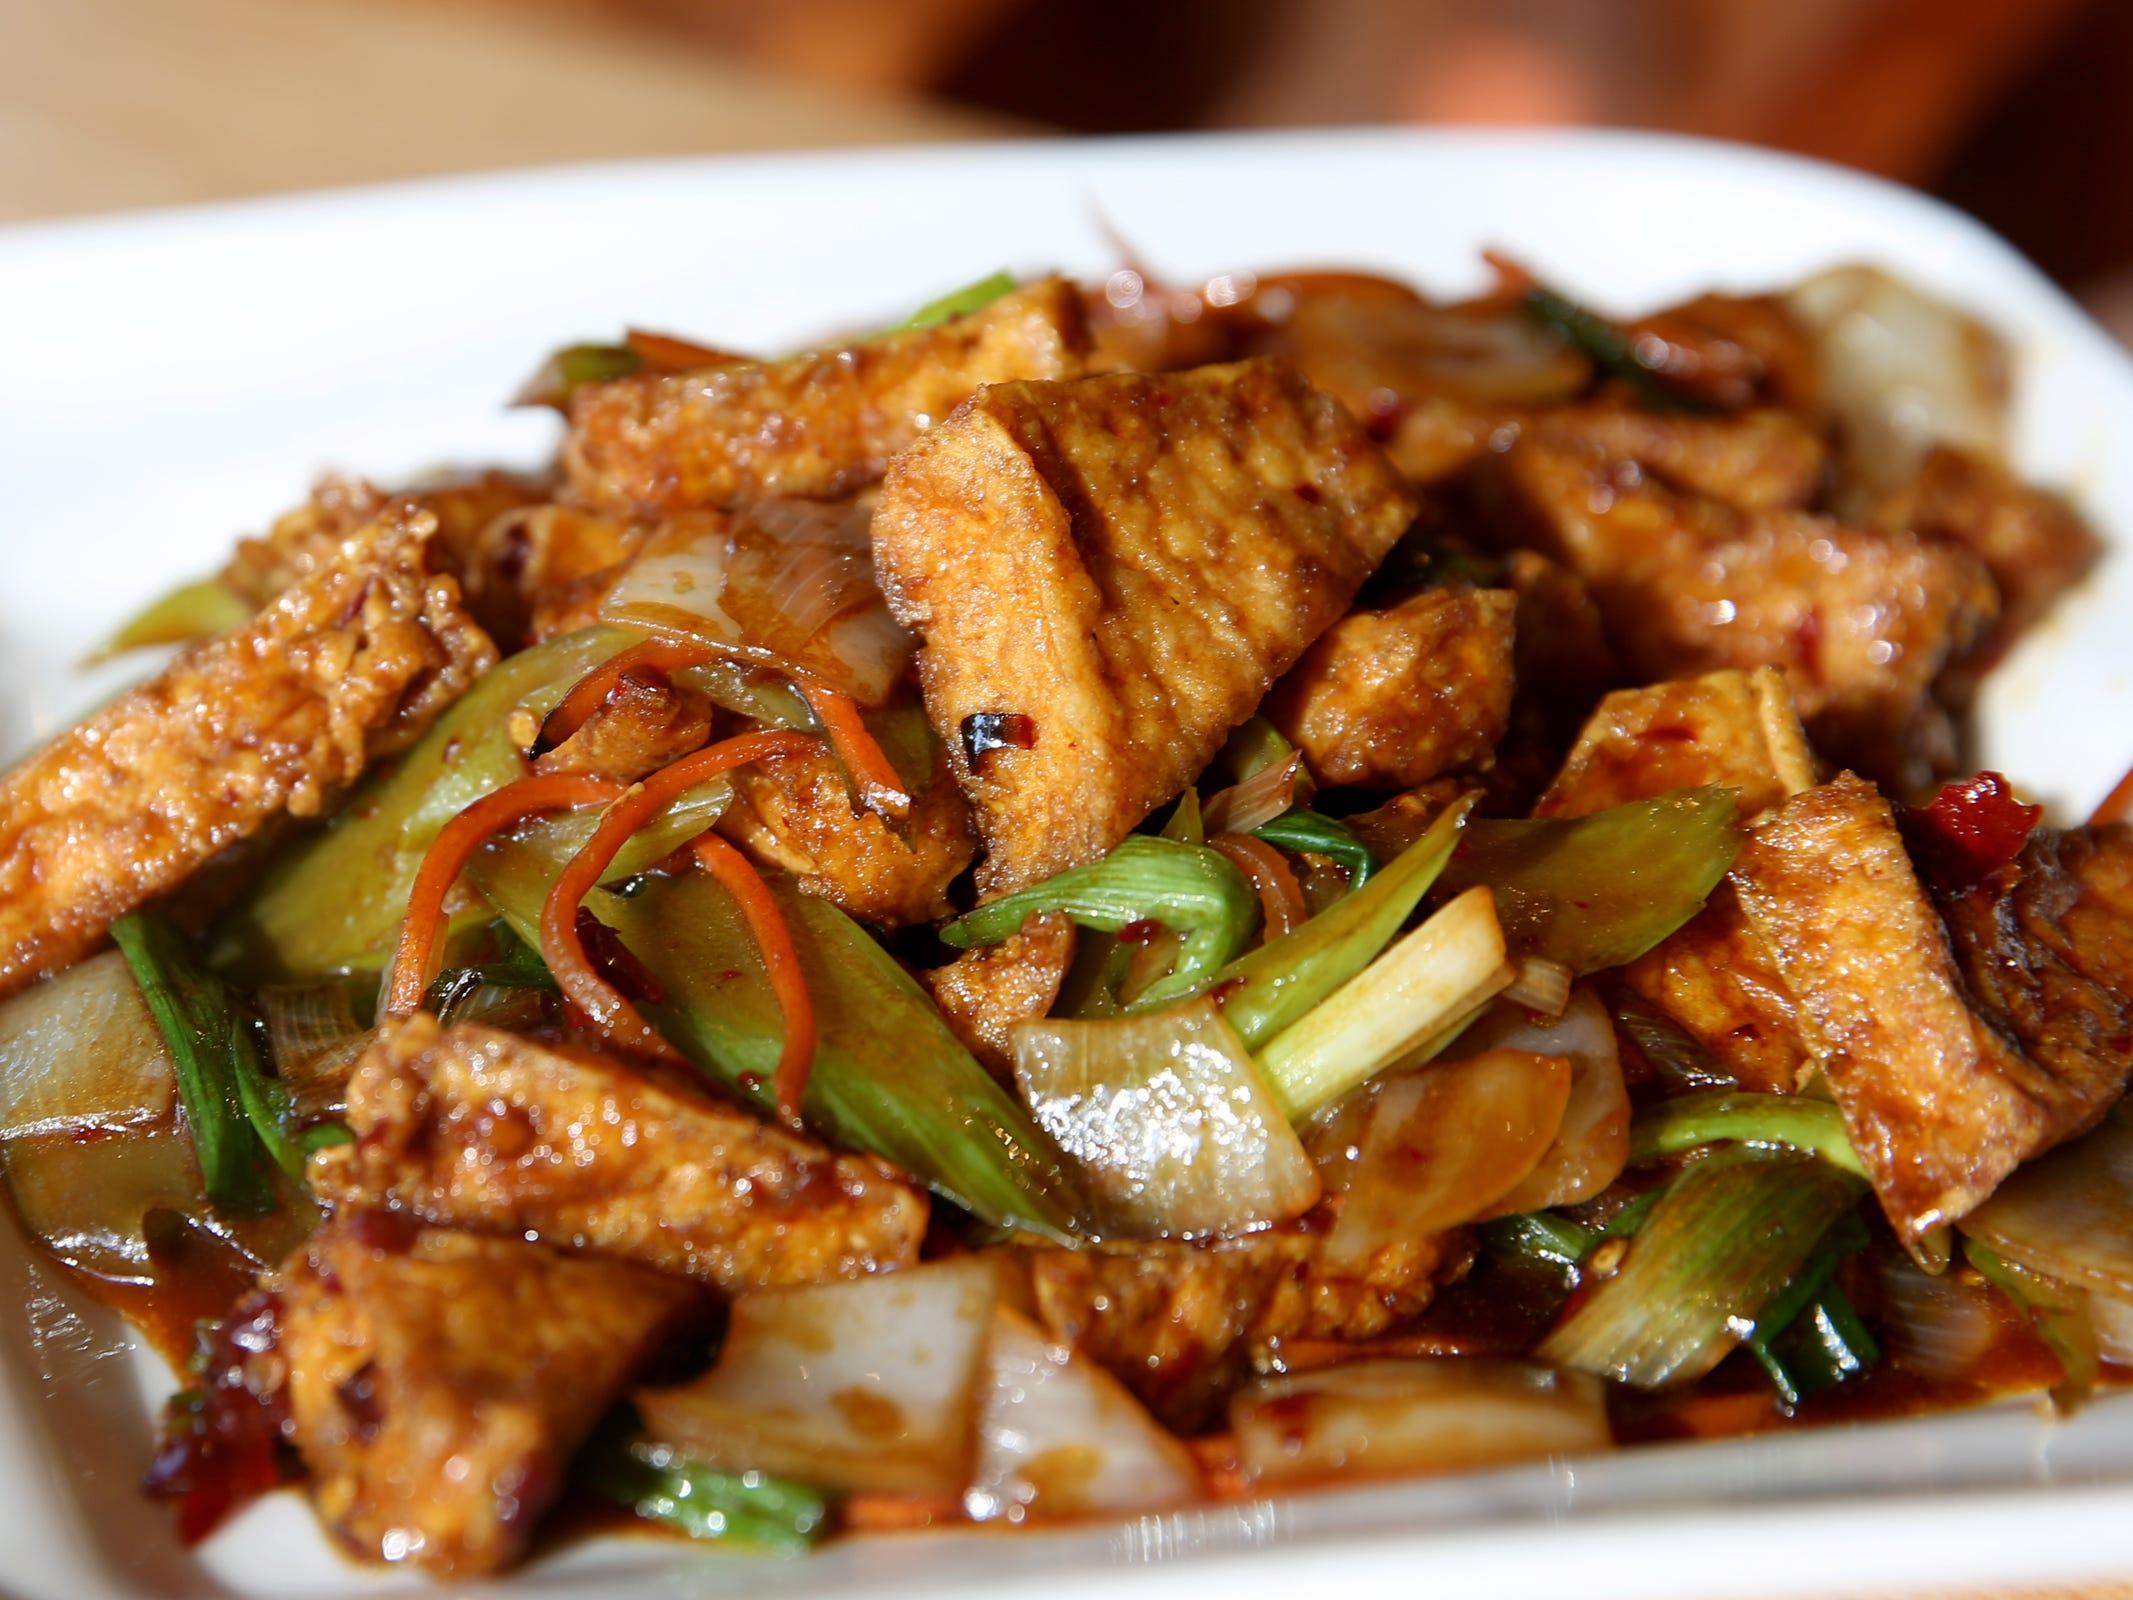 Szechuan style tofu at Chen's Family Dish in Salem on Thursday, Jan. 31, 2019.